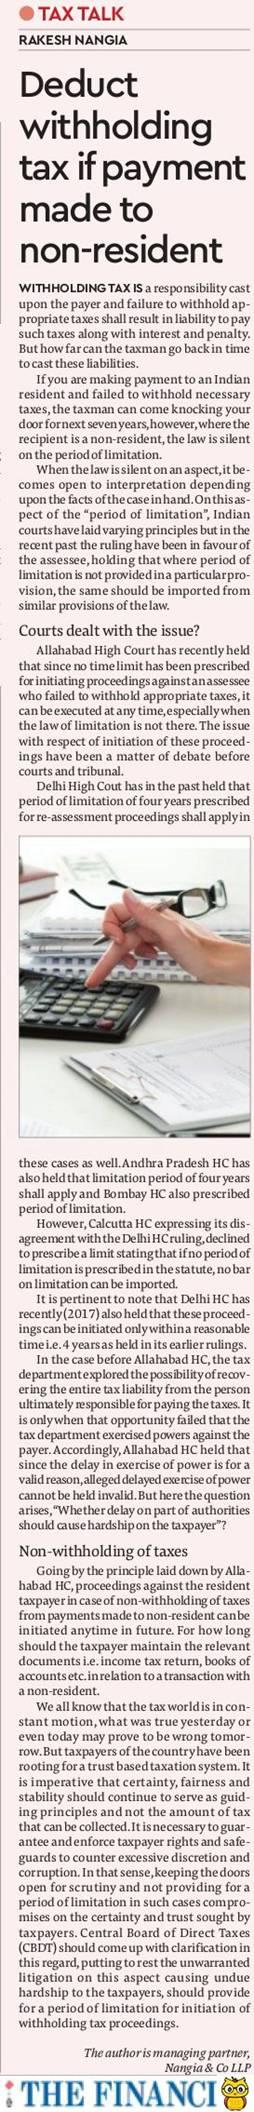 Withholding Tax - Rakesh Nangia